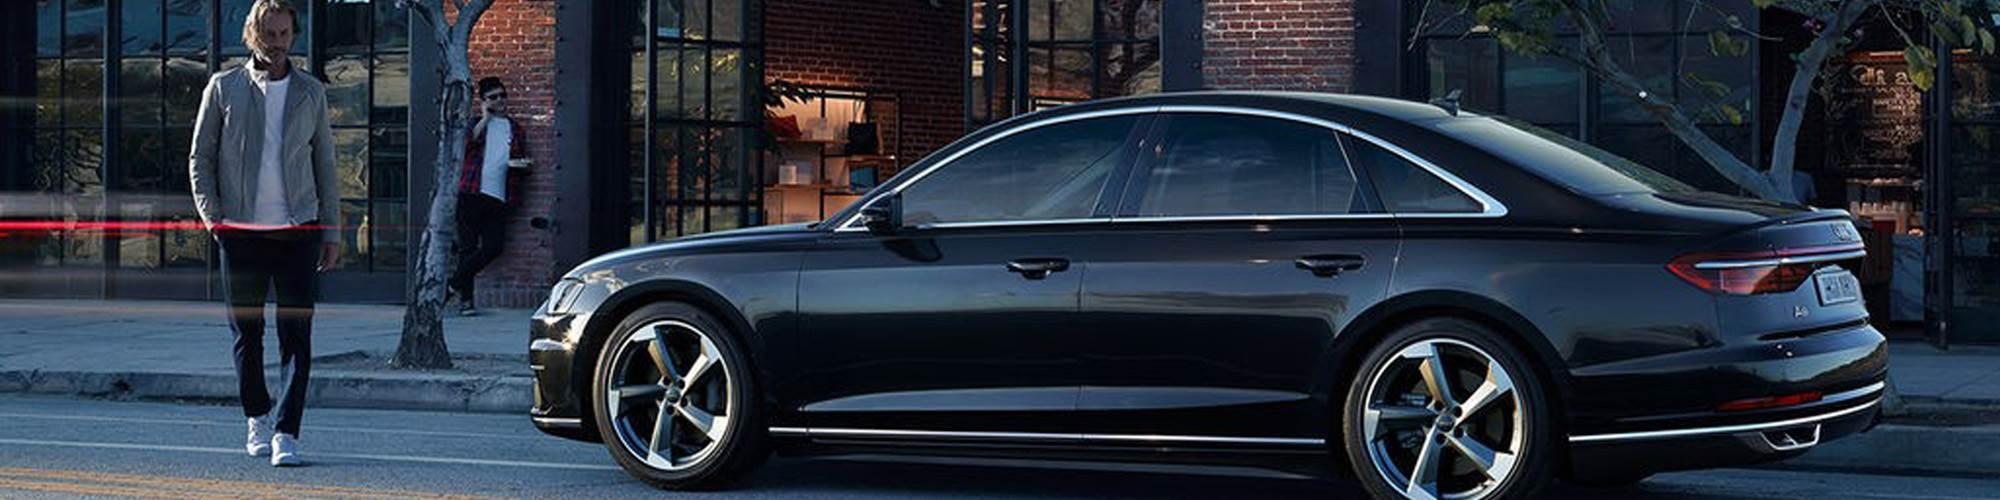 Audi Dealership Belfast Portadown Agnew Audi